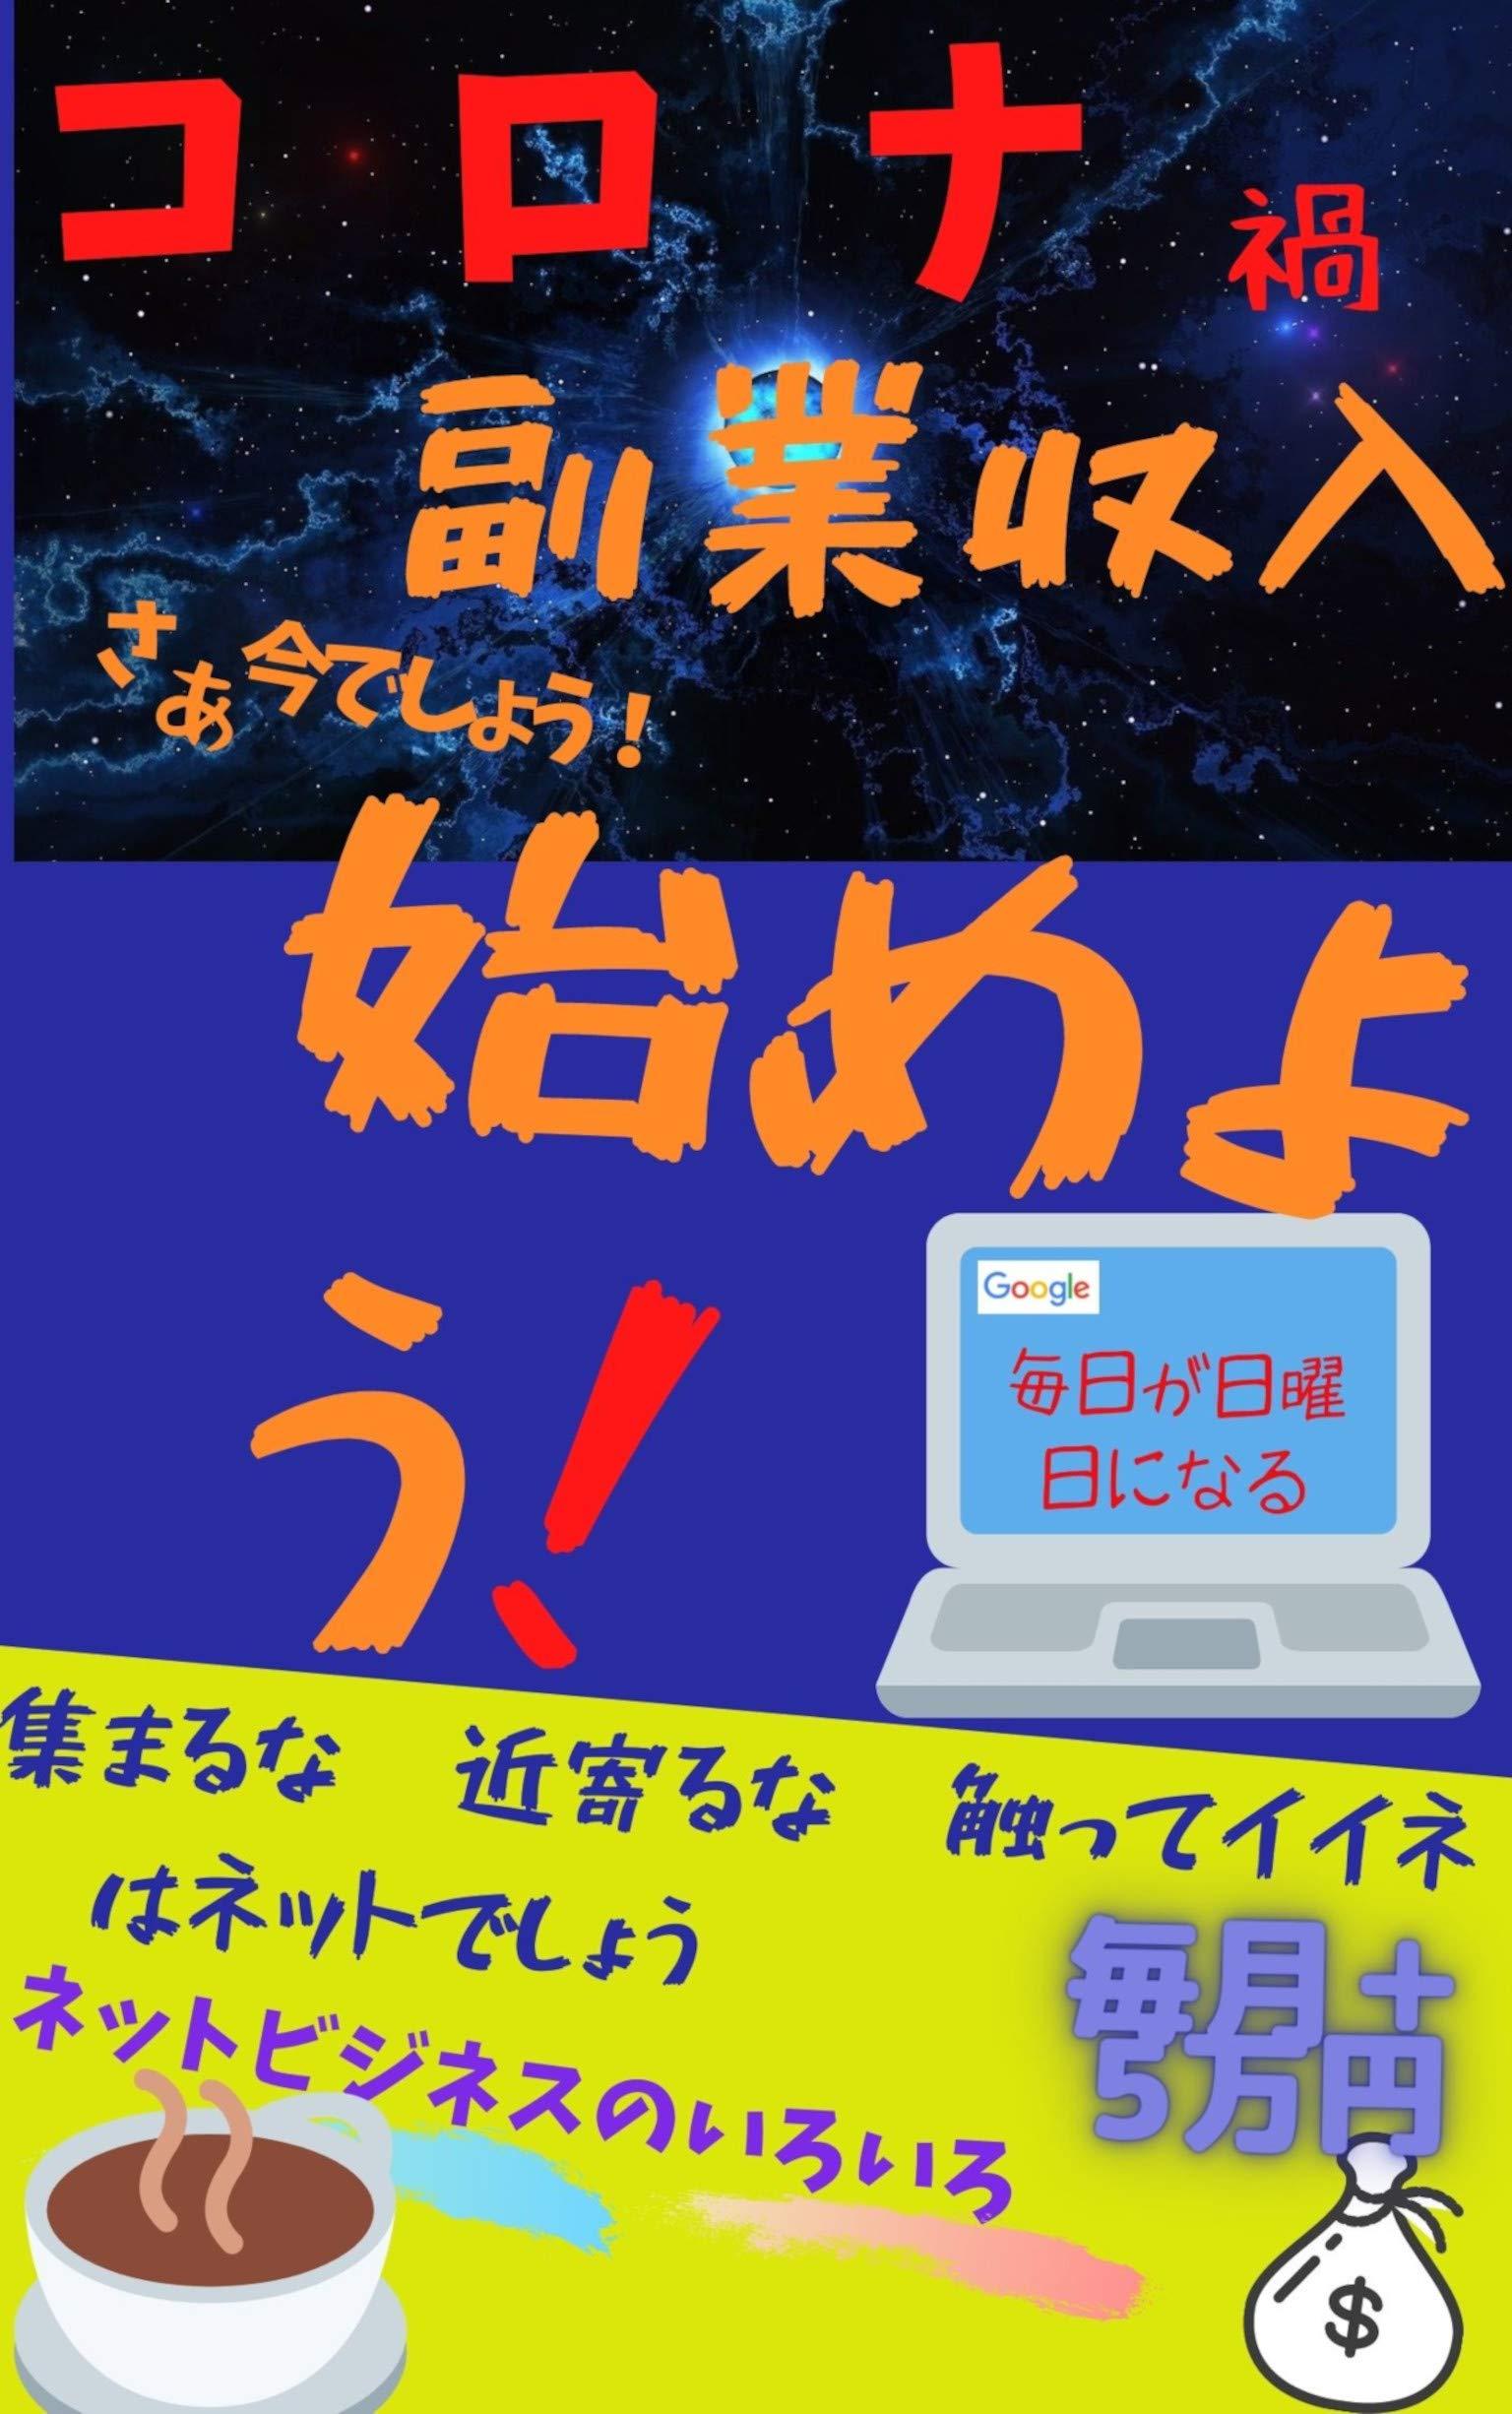 neltutobizinesu: hosutokoronakadenettobizinesu dennsisilyosiki (Japanese Edition)